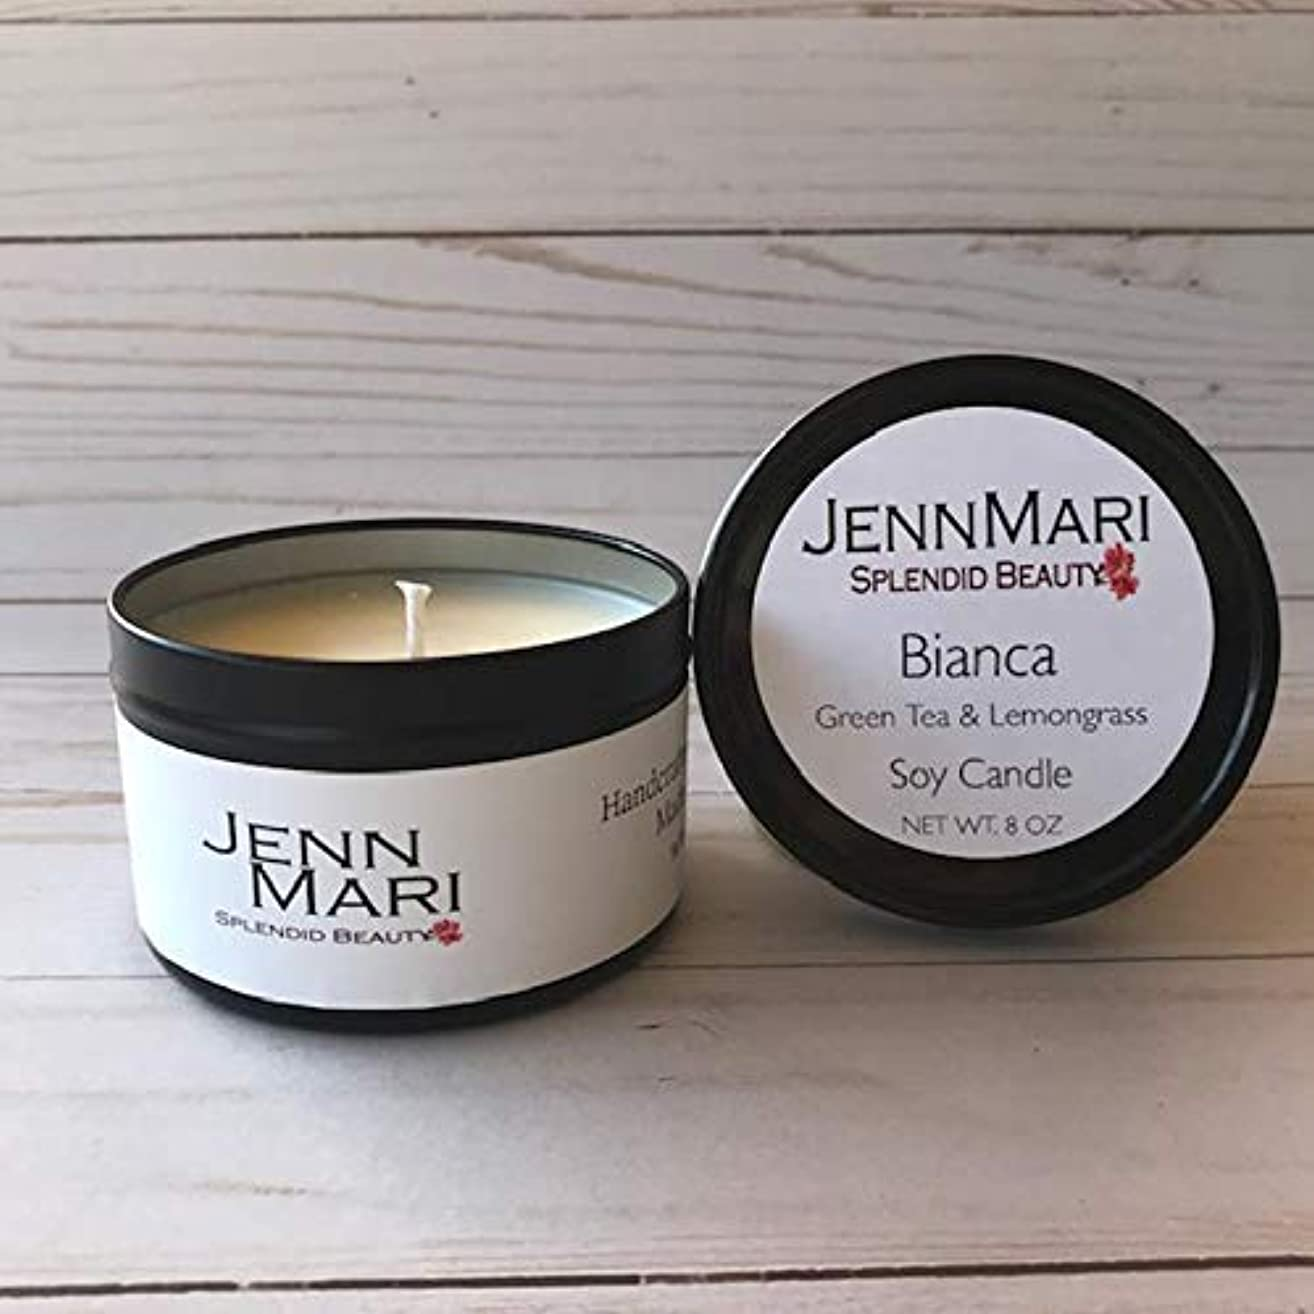 Splendid Beauty   Green Tea & Lemon Grass Scented Soy Candle 8 Oz Tin   Handmade   Eco-friendly   Vegan   Cotton Wick   100% Soy Wax